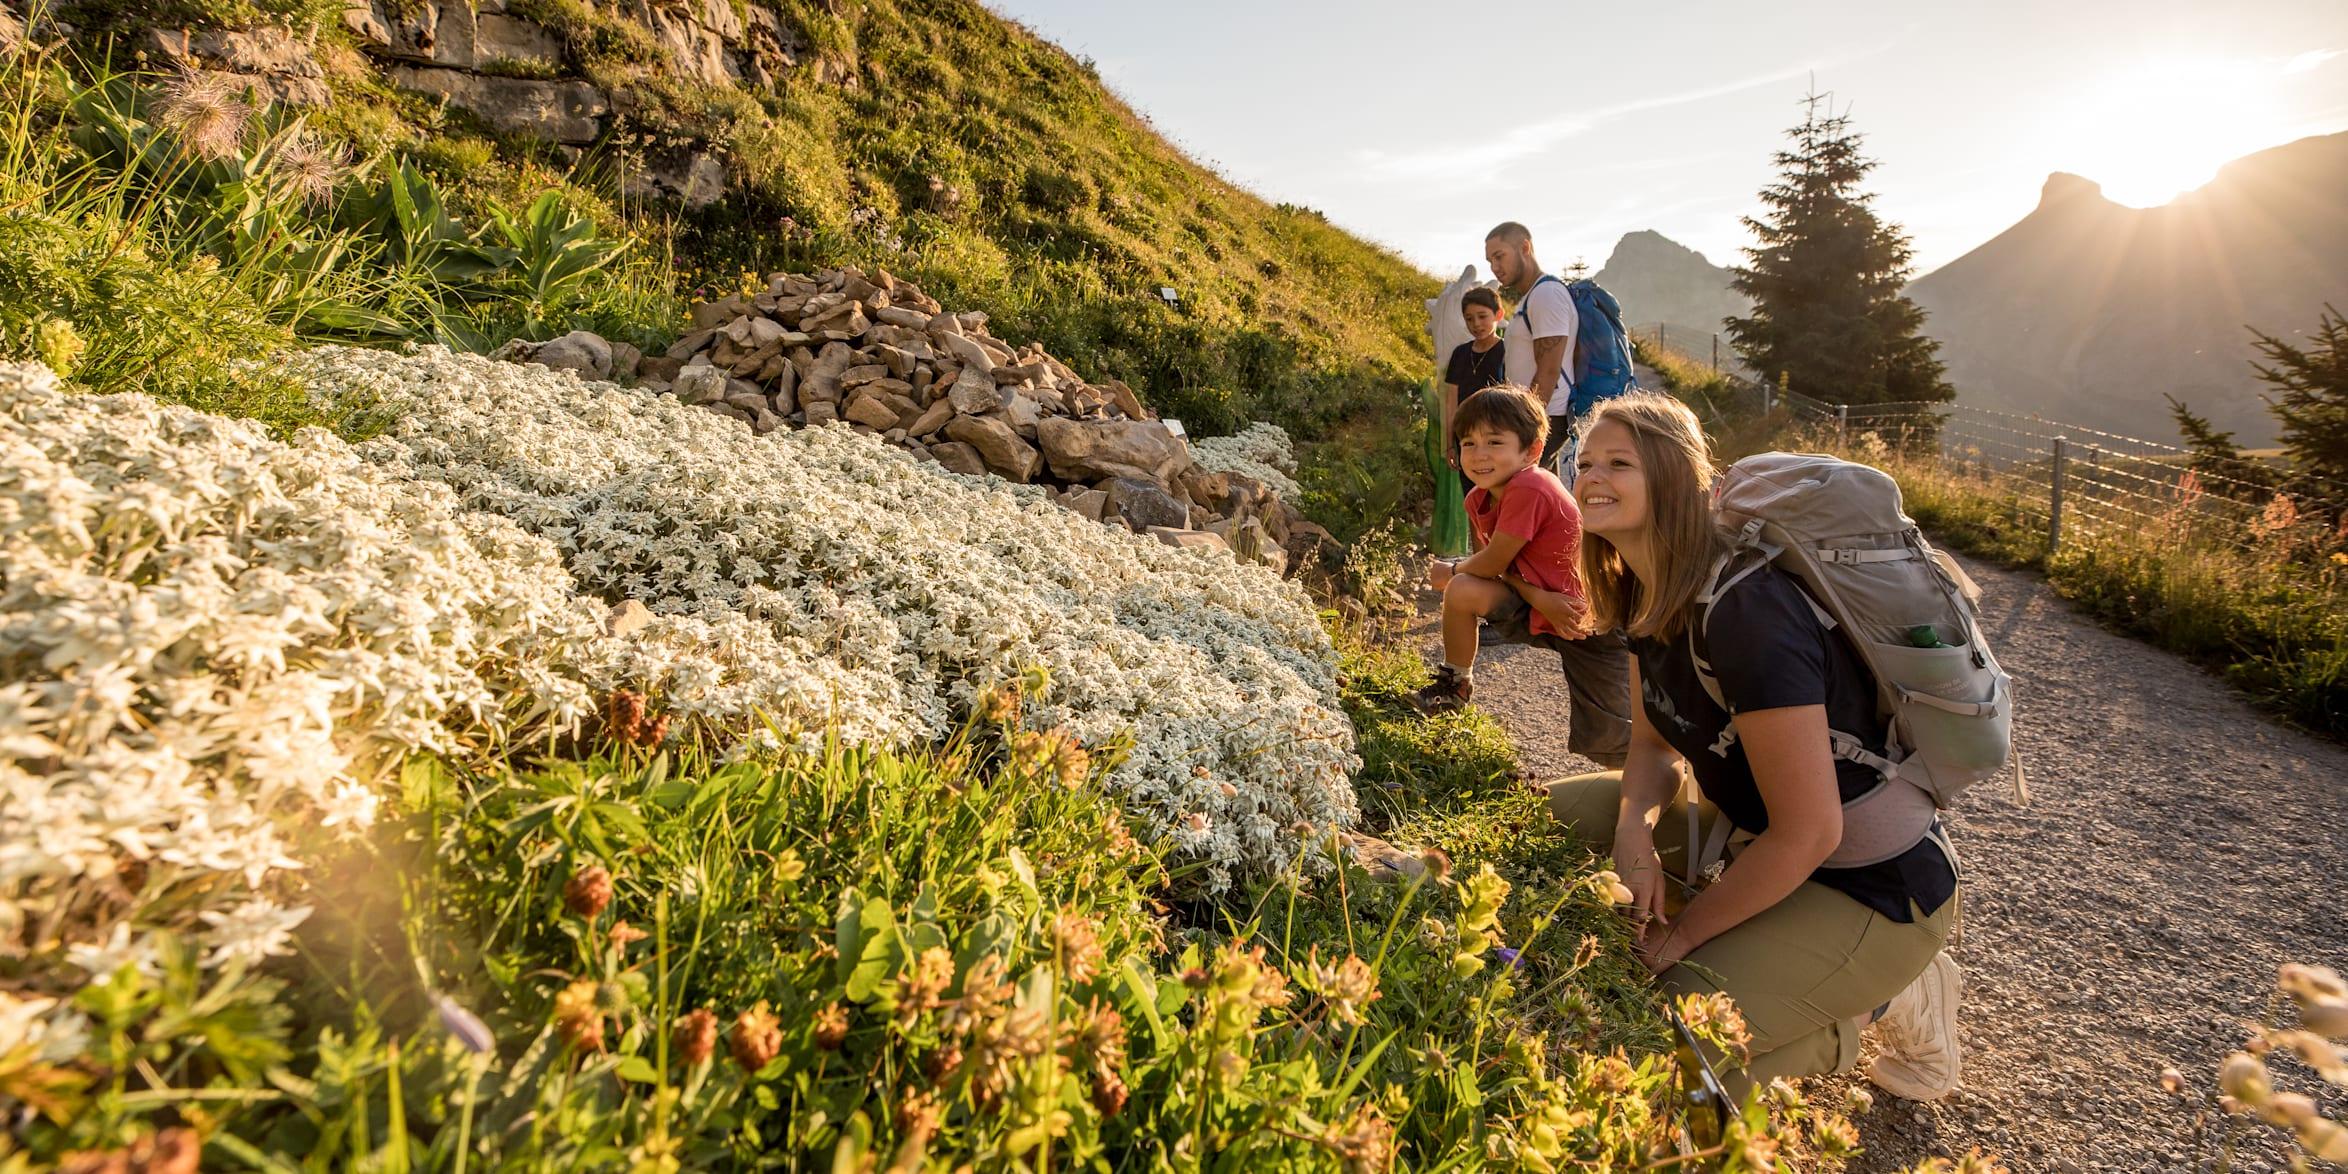 Berge, Eiger, Eiger-Mönch-Jungfrau, Erlebnisse-Aktivitaeten, Jungfrau, Mönch, Publikationen, Schynige-Platte, Screen-Content, Wandern, jungfrau.ch